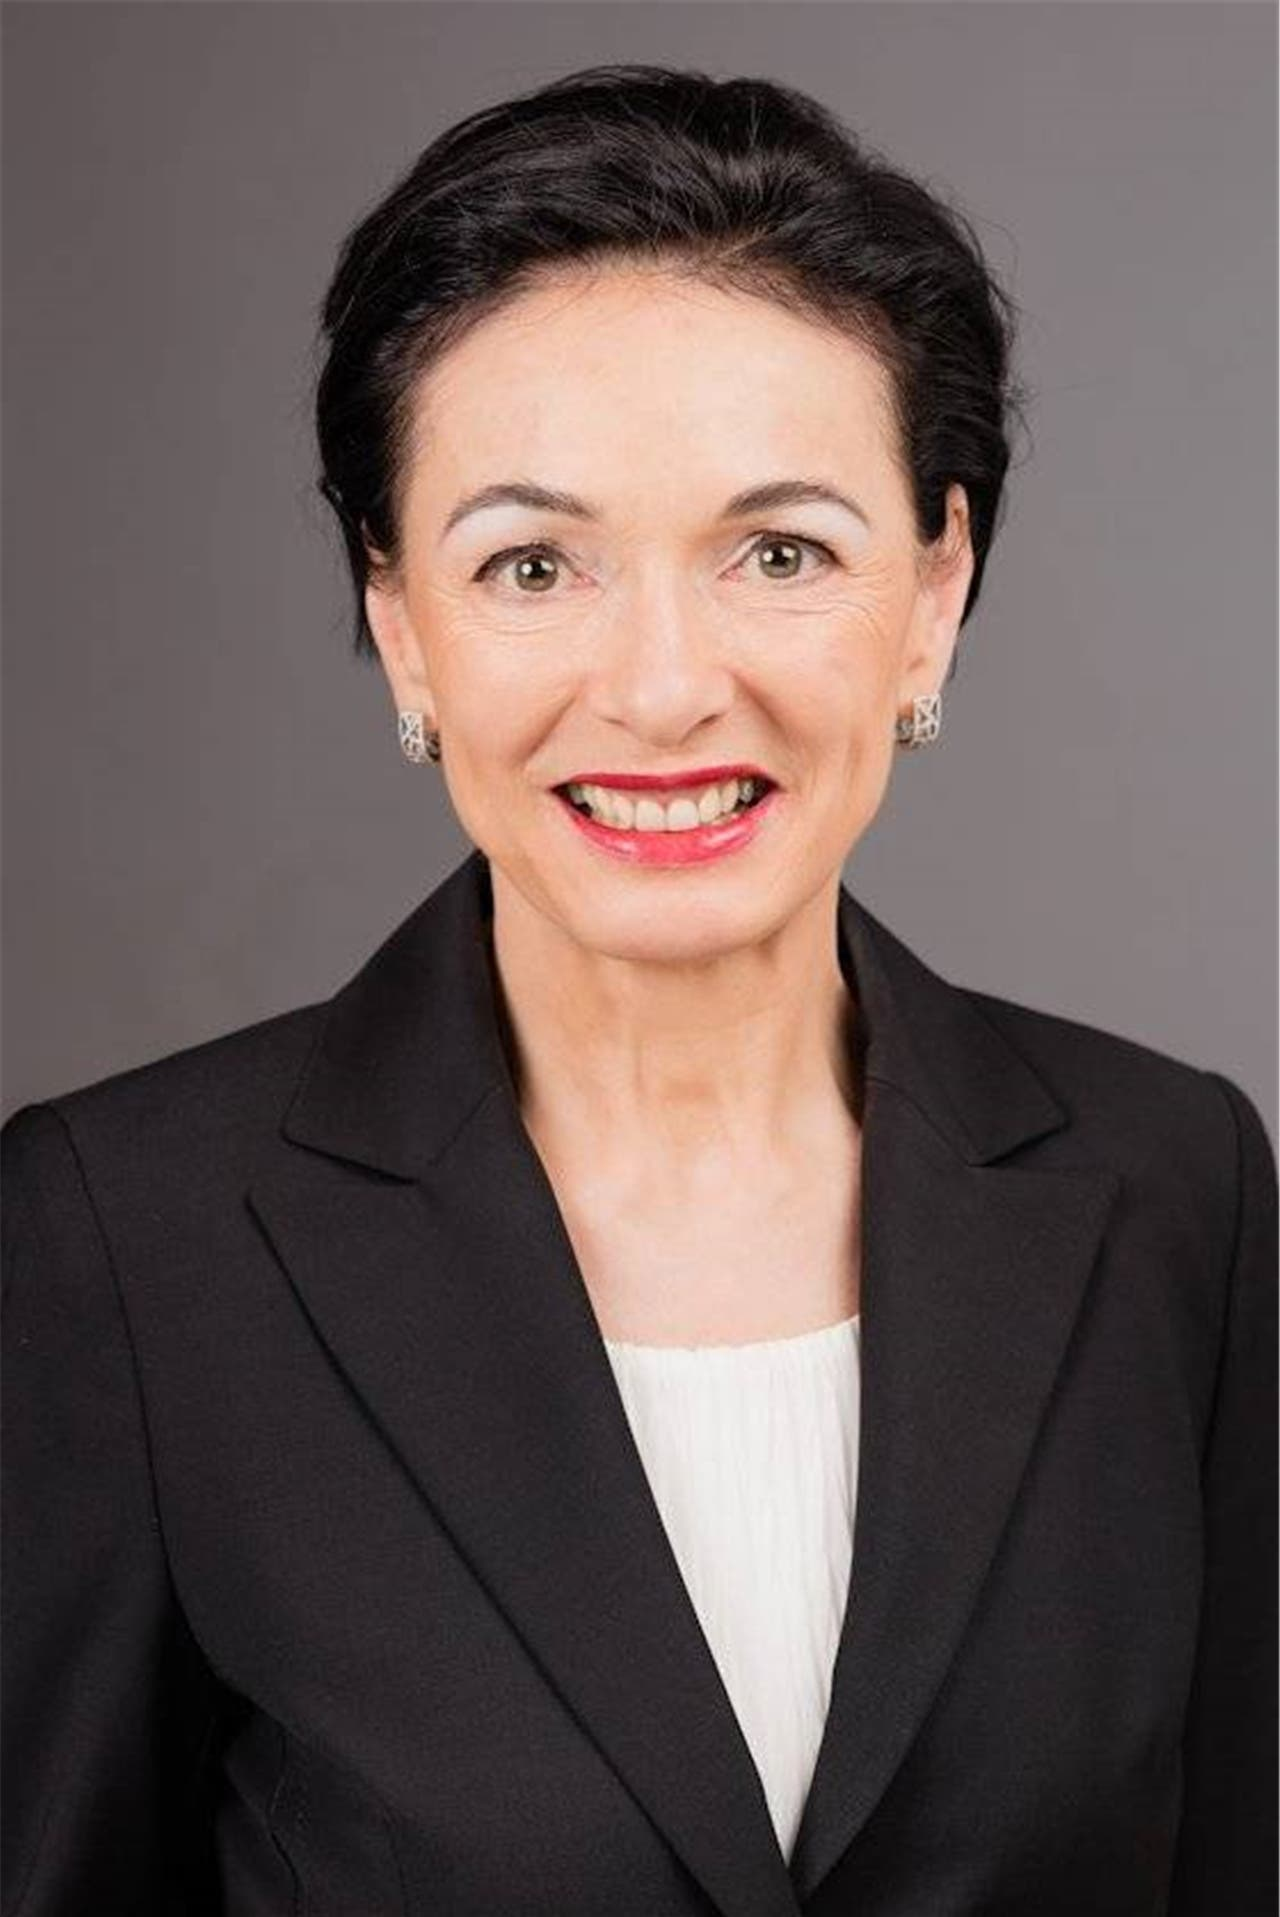 Empfohlen: Marianne Binder, CVP-Grossrätin, Kommunikationsberaterin.